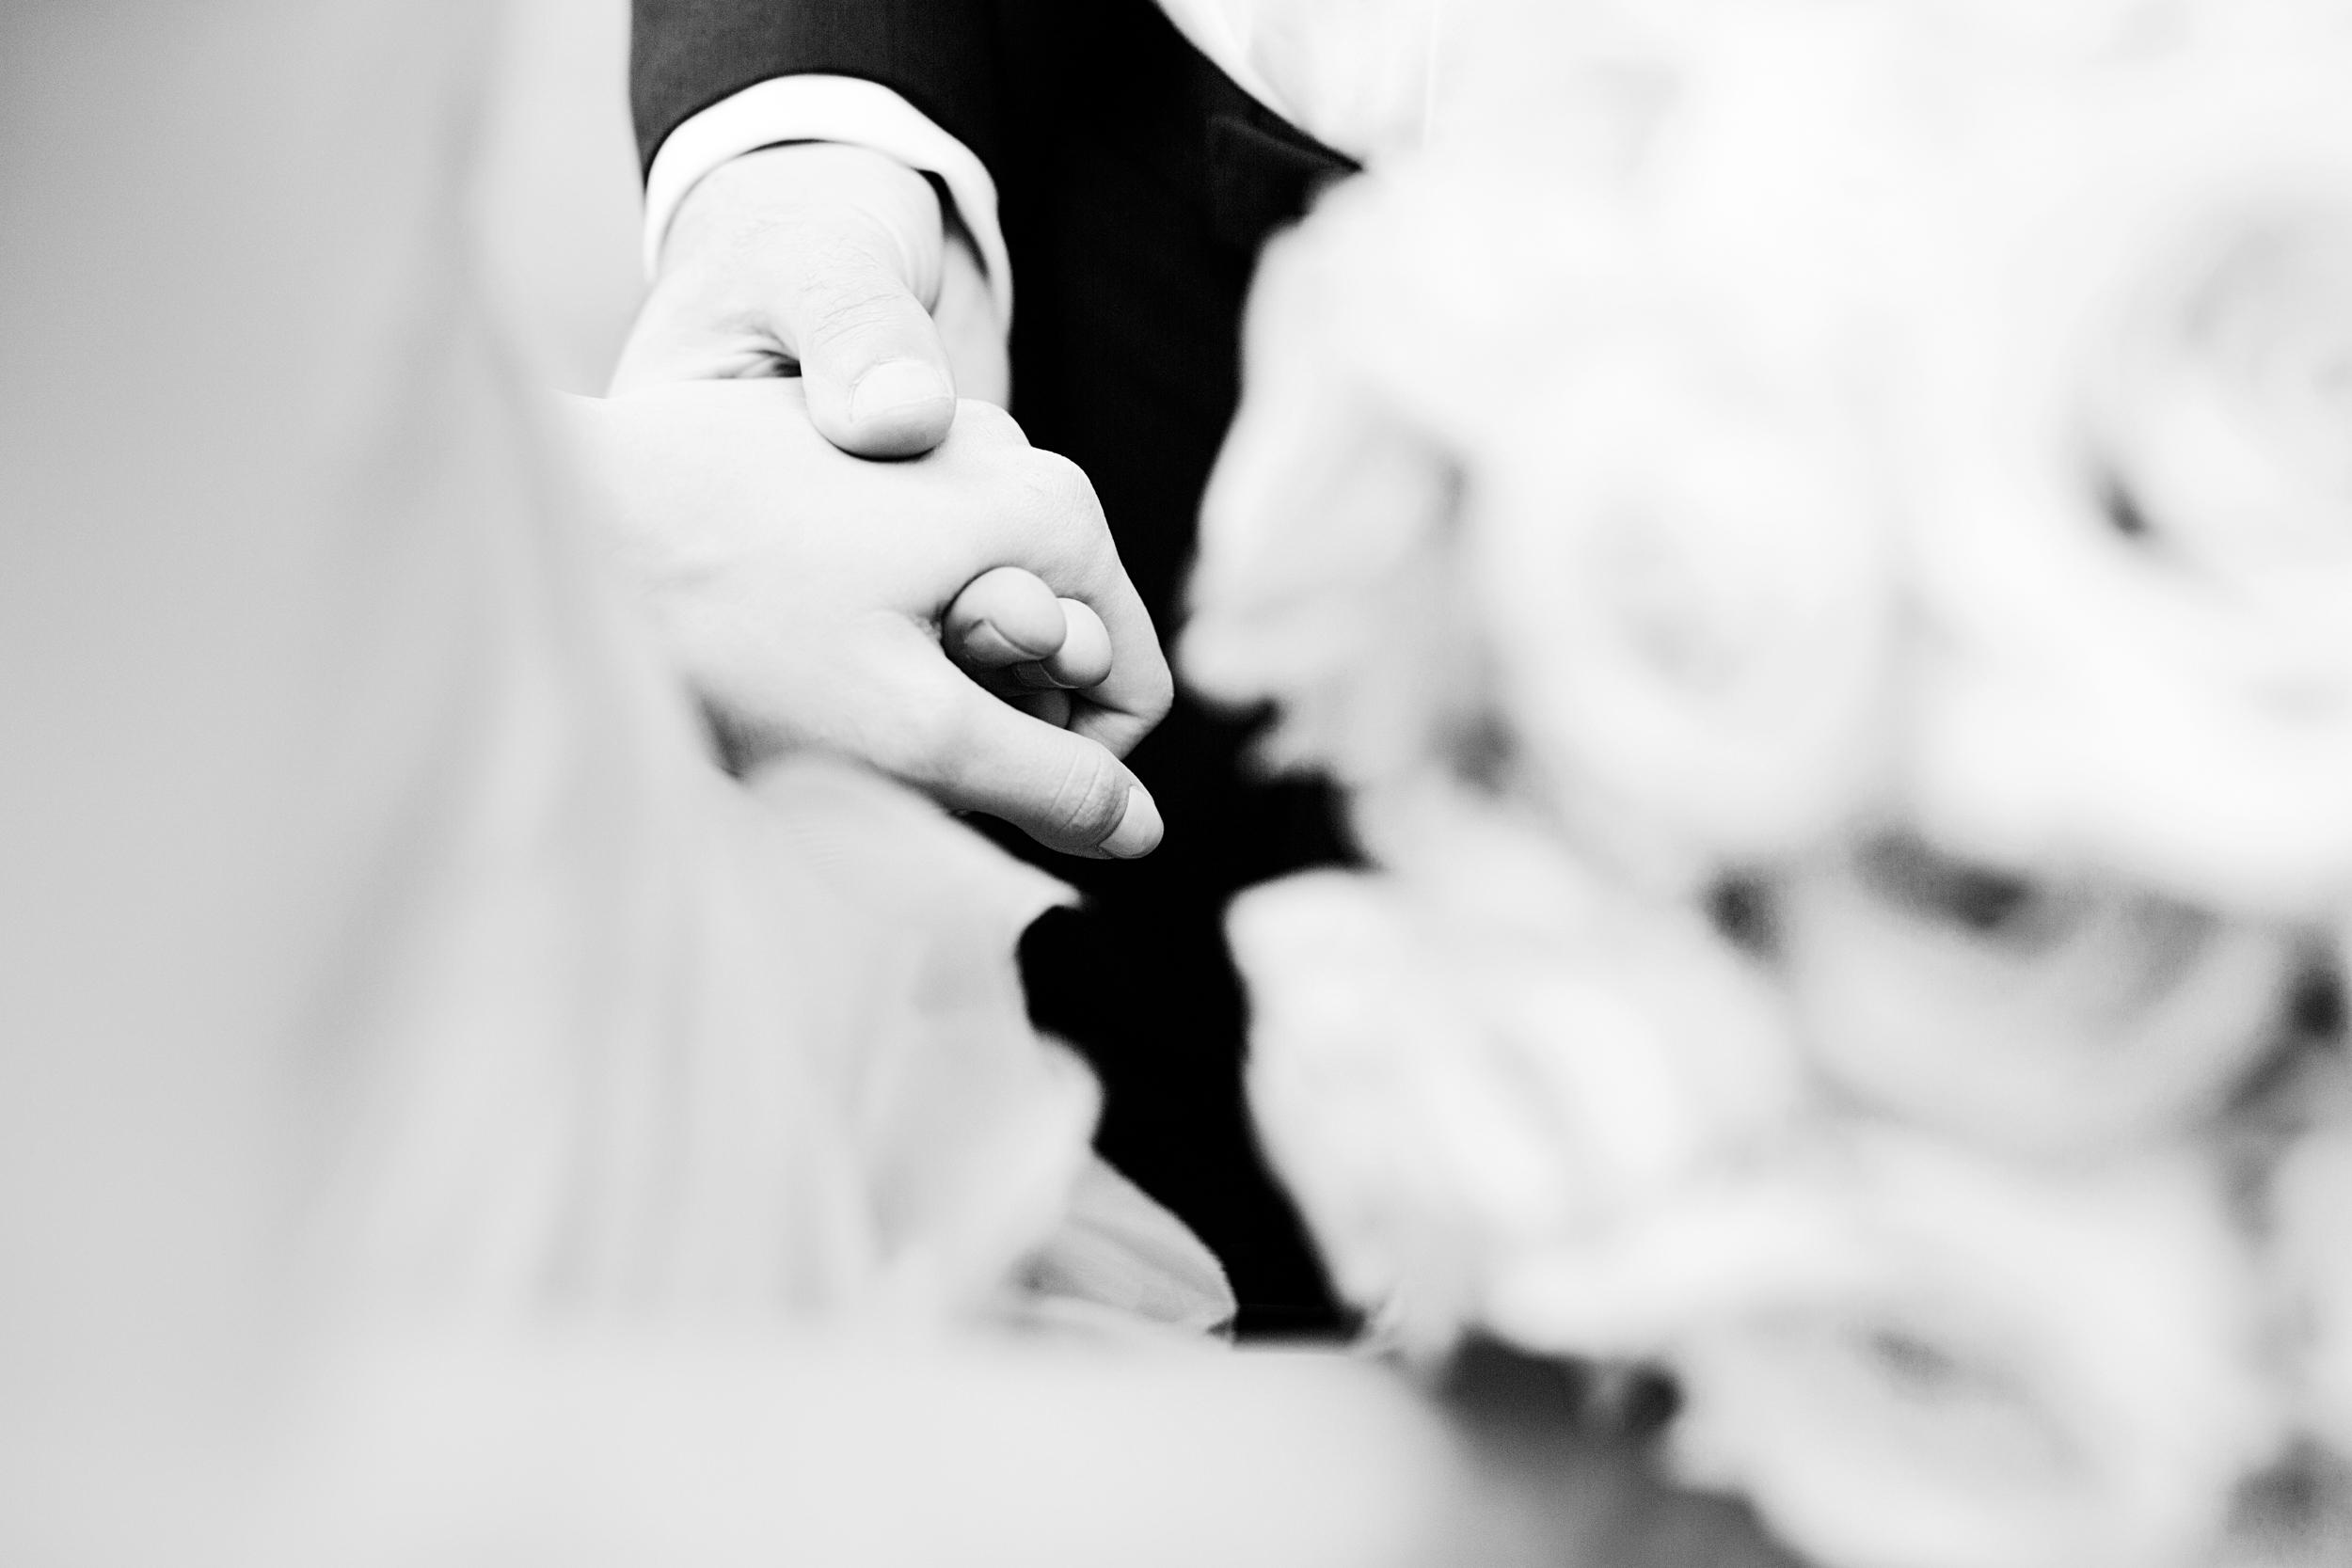 Ceci_New_York_Ceci_Style_Ceci_Johnson_Luxury_Lifestyle_Floral_Lace_Wedding_Letterpress_Inspiration_Design_Custom_Couture_Personalized_Invitations_-4.jpg